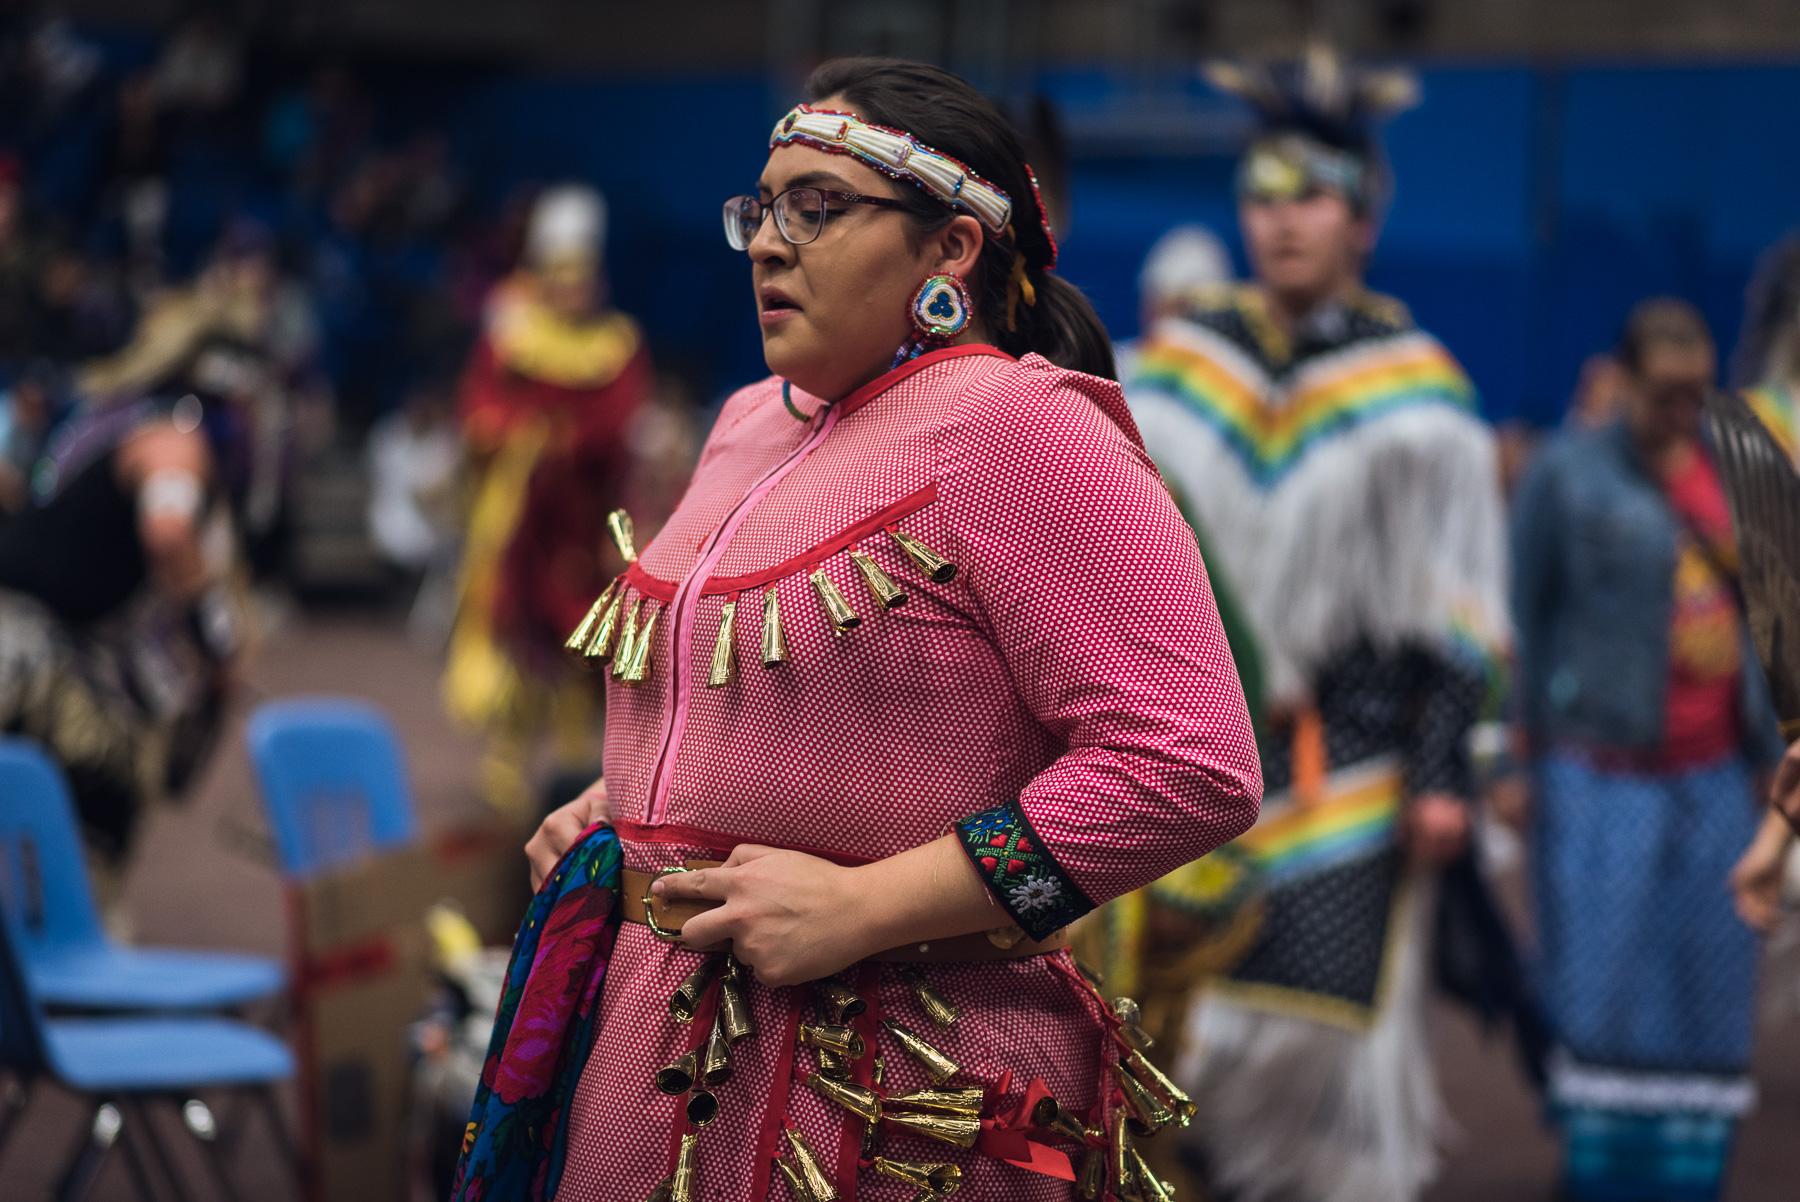 31st-Annual-LUNSA-Powwow-Blog-59.jpg